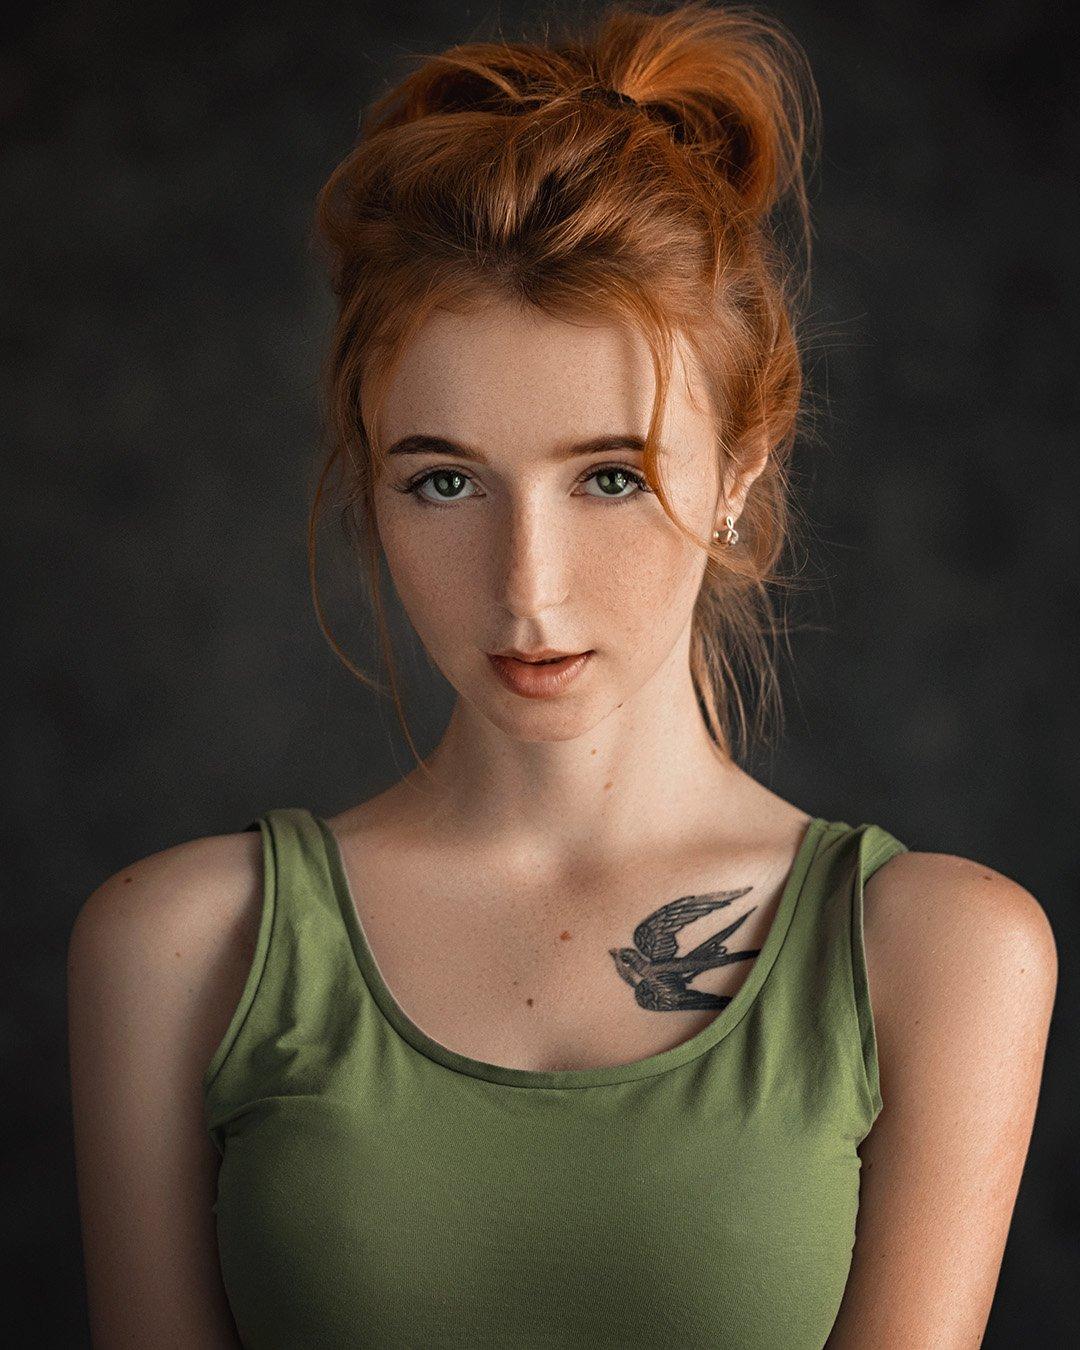 art, portrait, girl, model, арт, портрет, девушка, модель, Евгений Сибиряев